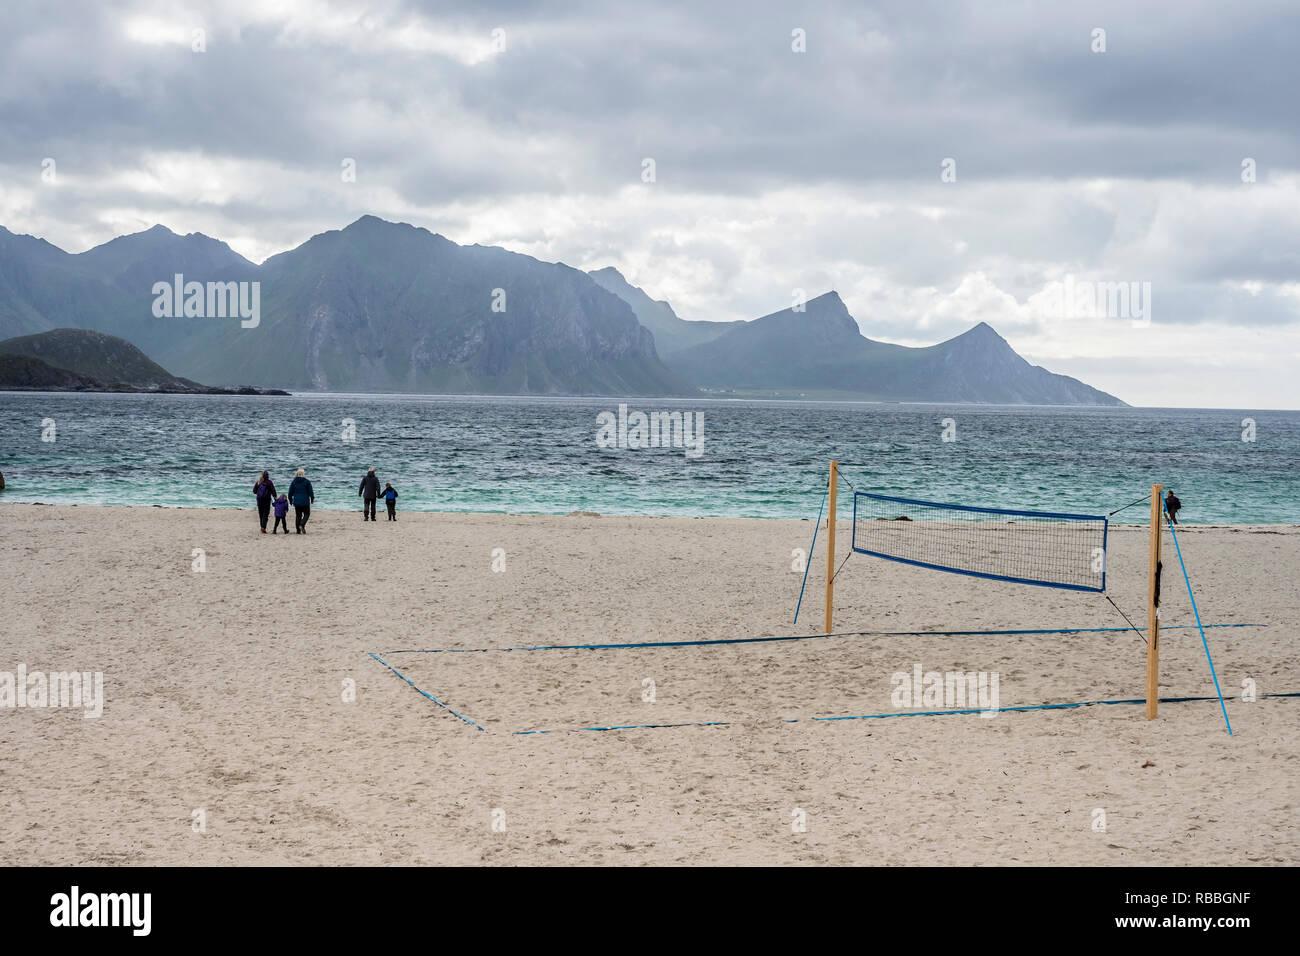 Hauklandstranda, Haukland beach,  sandy beach, volleyball net, beachvolleyball, island Vestvagöy, Lofoten, Norway - Stock Image